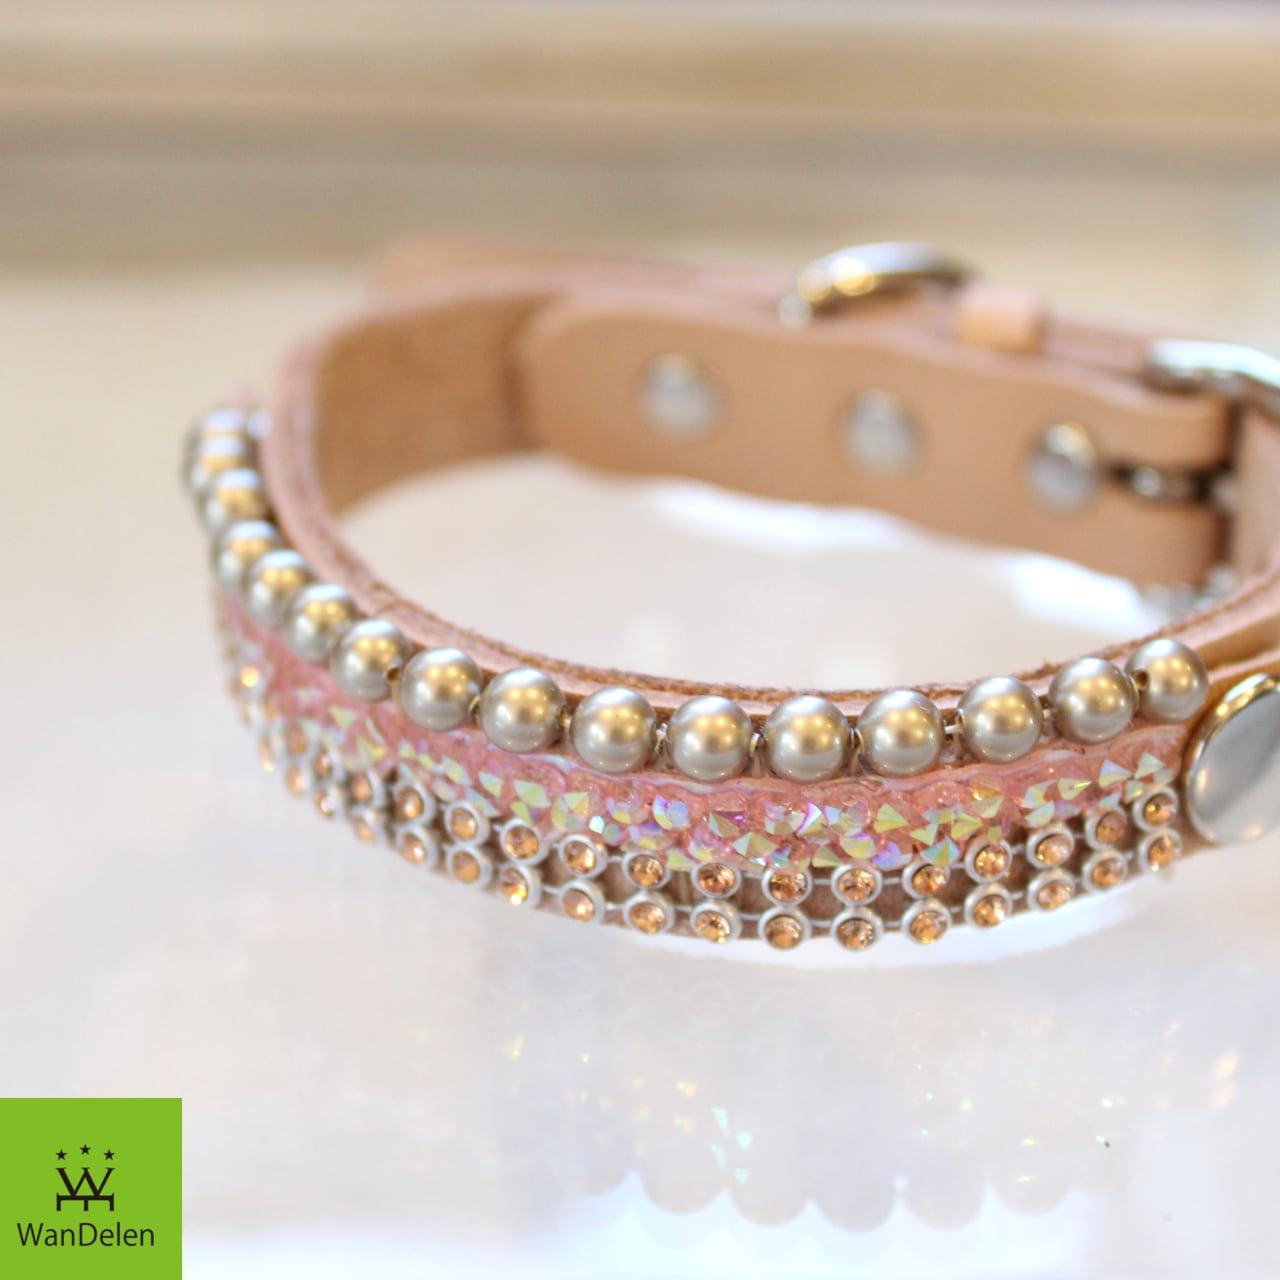 """ WanDelen"" Dog Necklace (combination pink)"